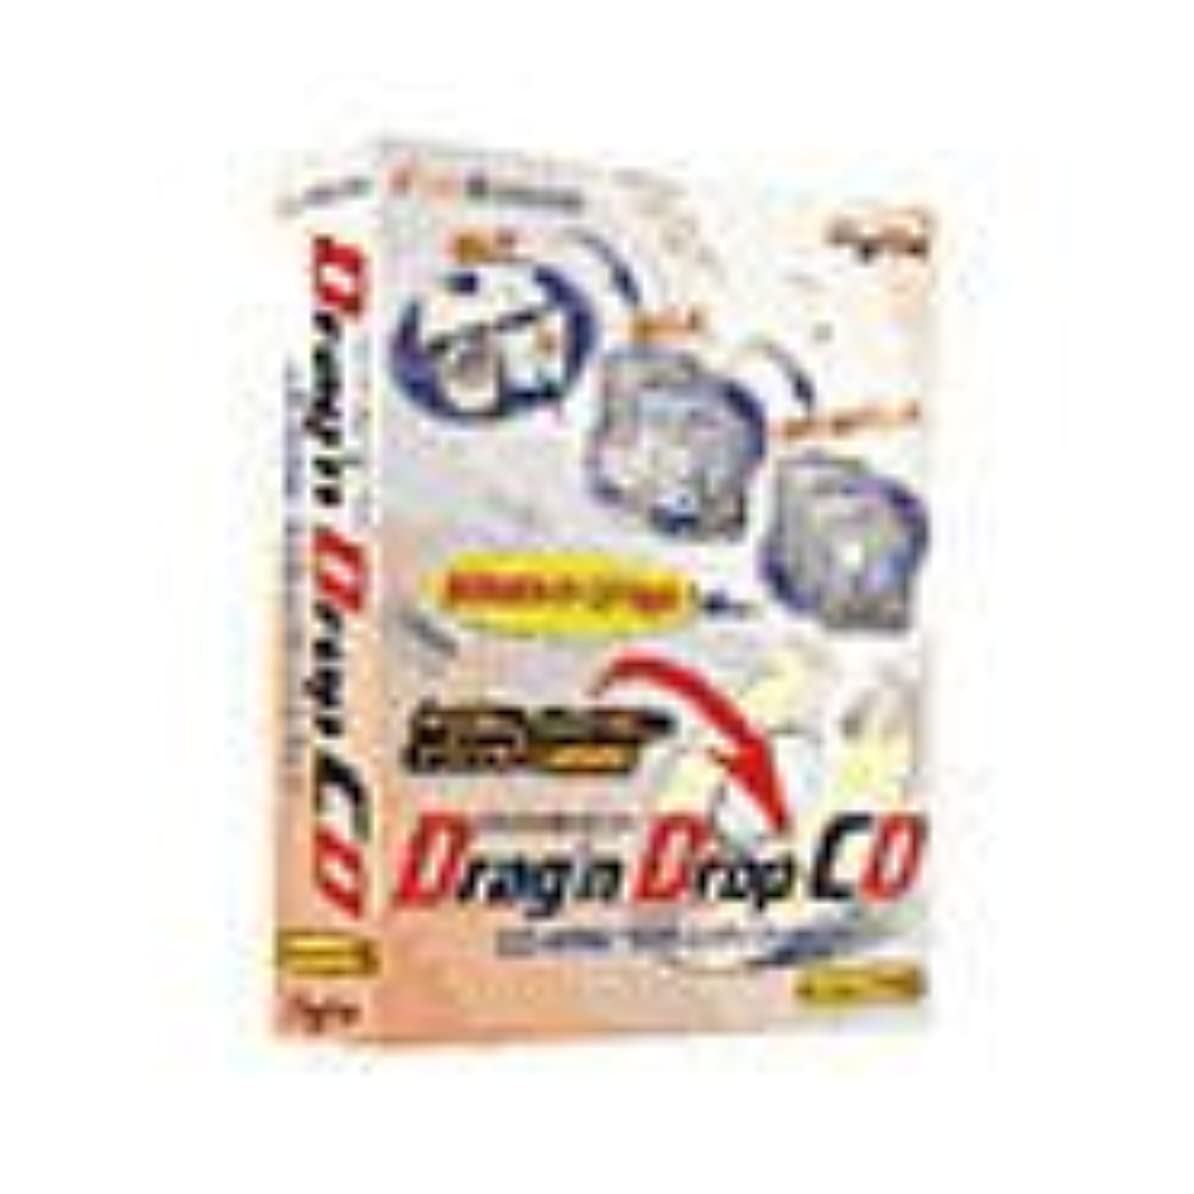 Drag'n Drop CD